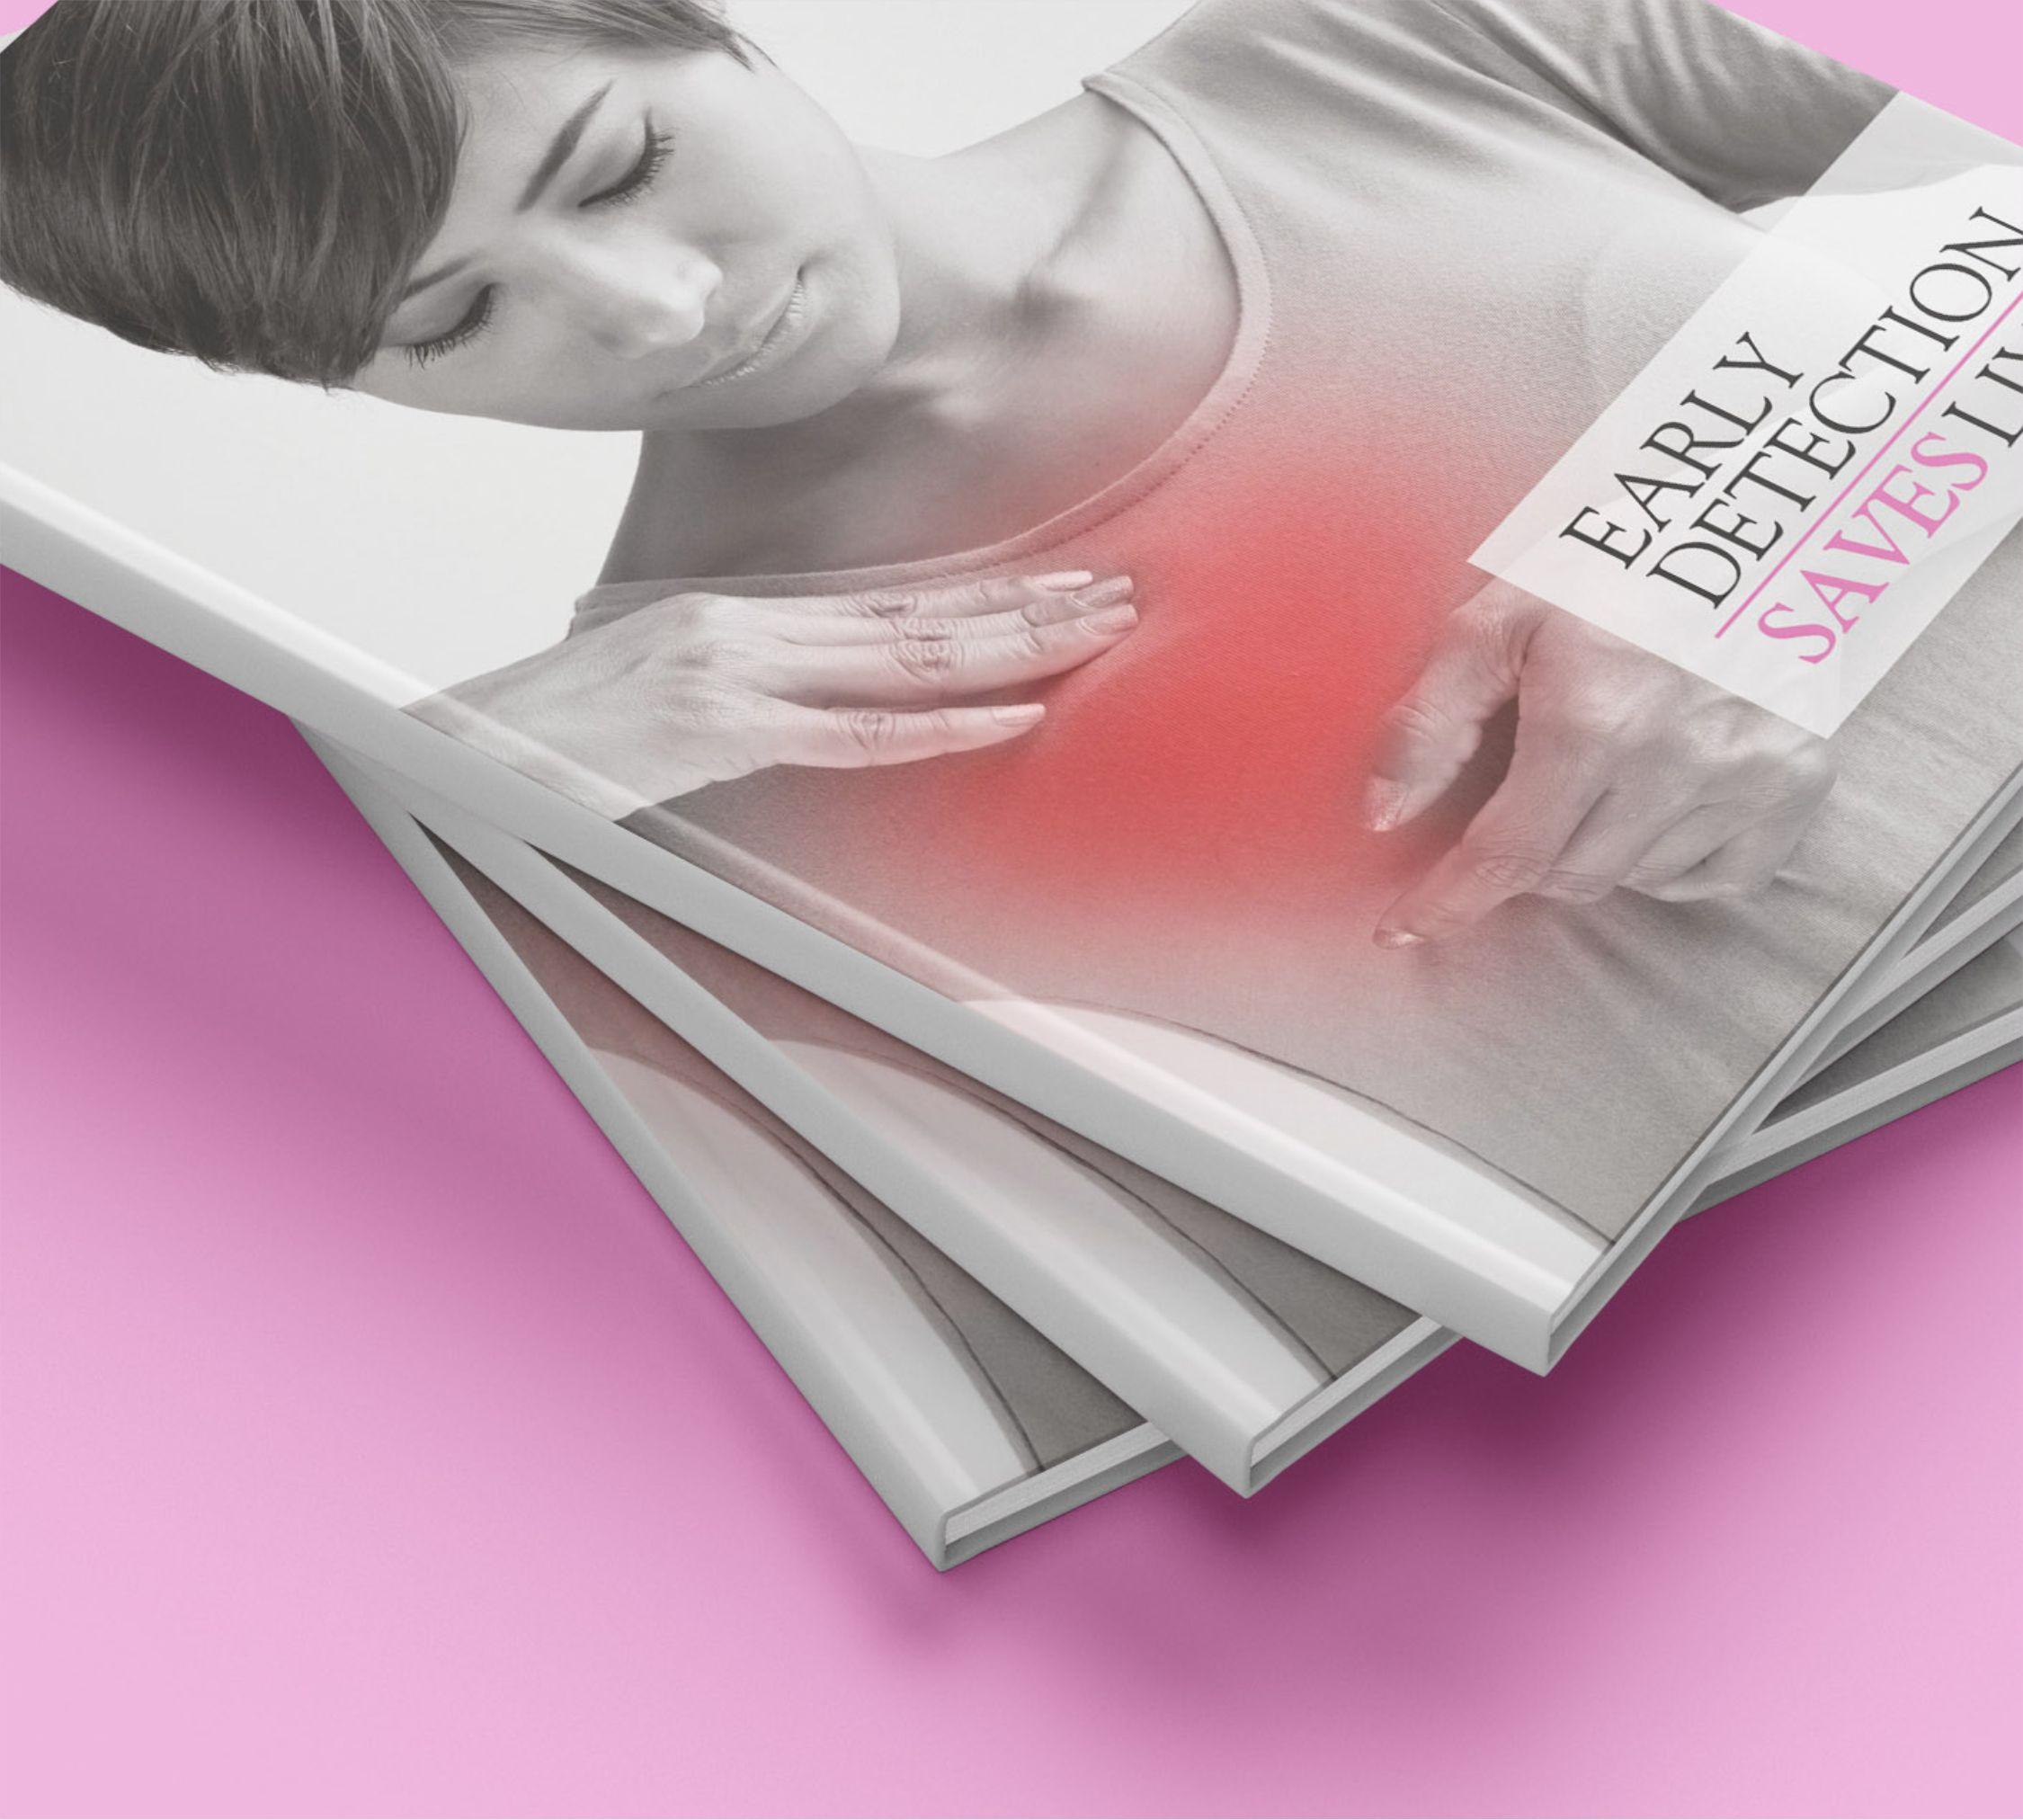 Fujifilm Breast Cancer Book 2